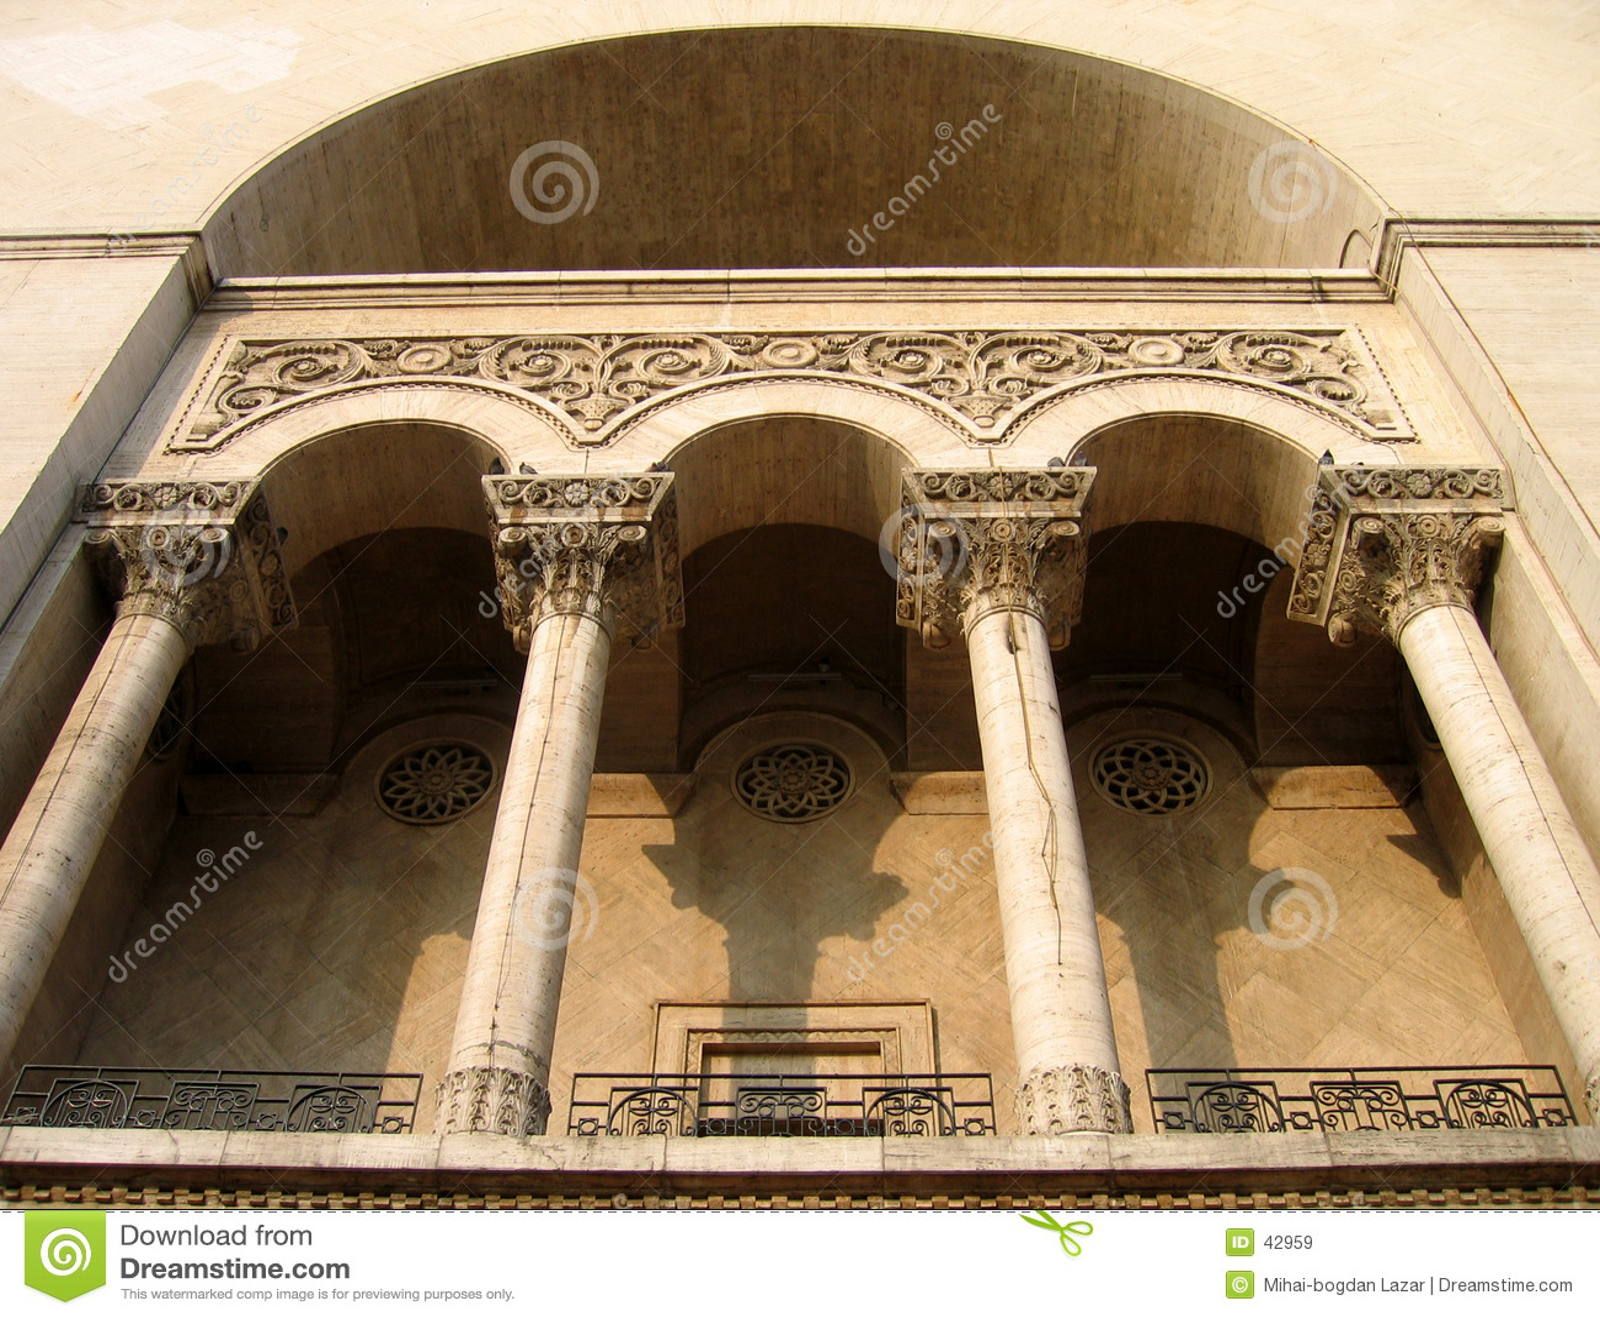 Opera house, Timisoara Romania